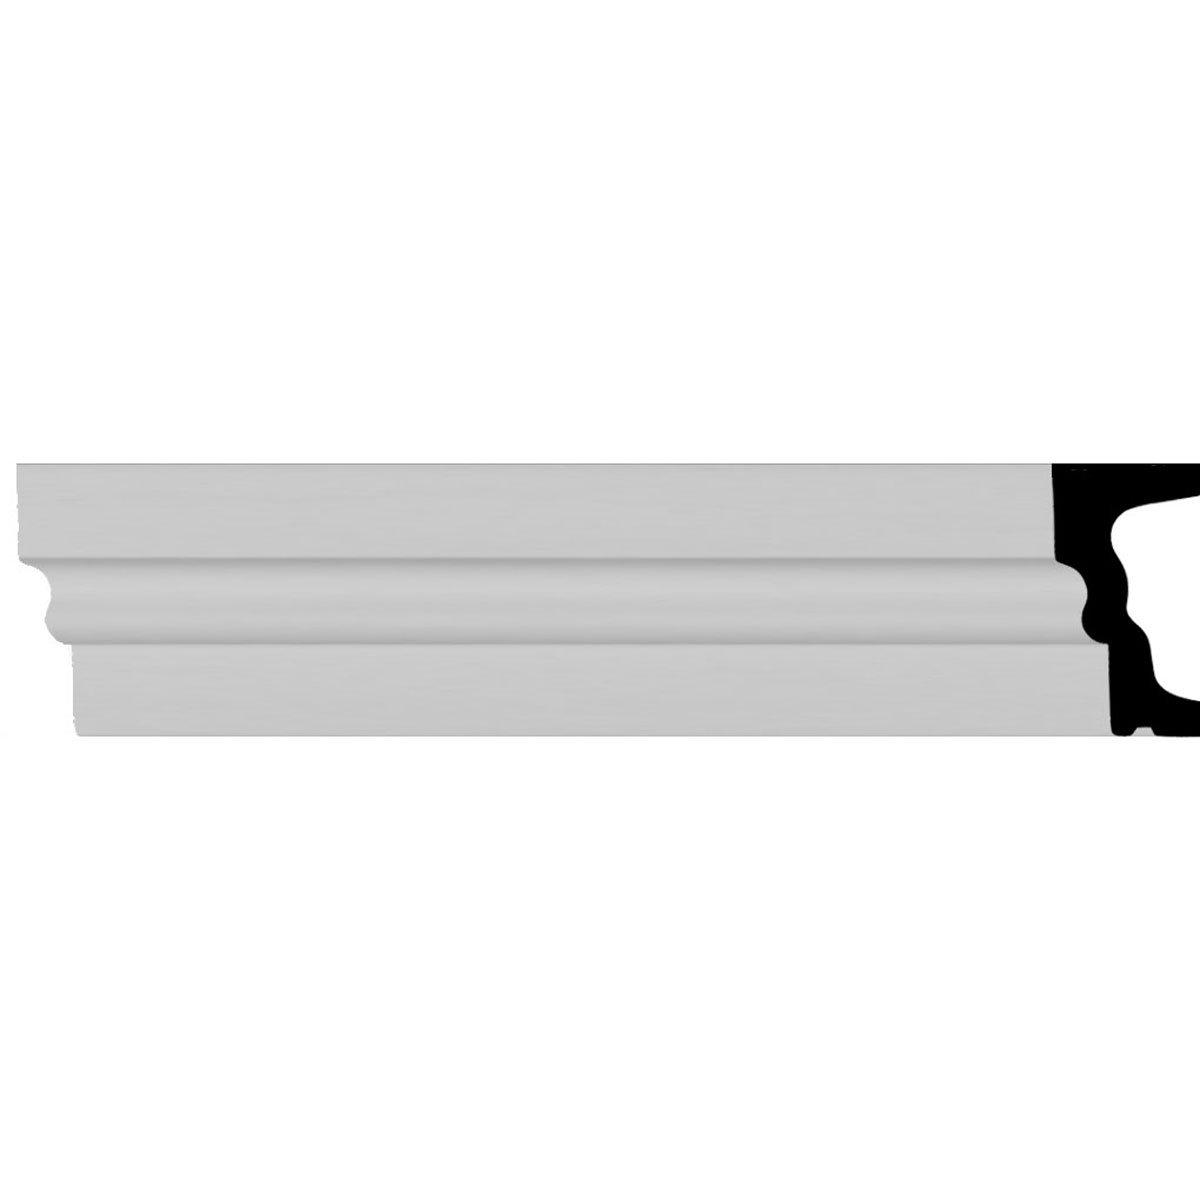 Ekena Millwork MLD06X03ST-CASE-12 5 1/2 inch H x 2 3/4 inch P x 94 1/2 inch L Standard Moulding (12-Pack),